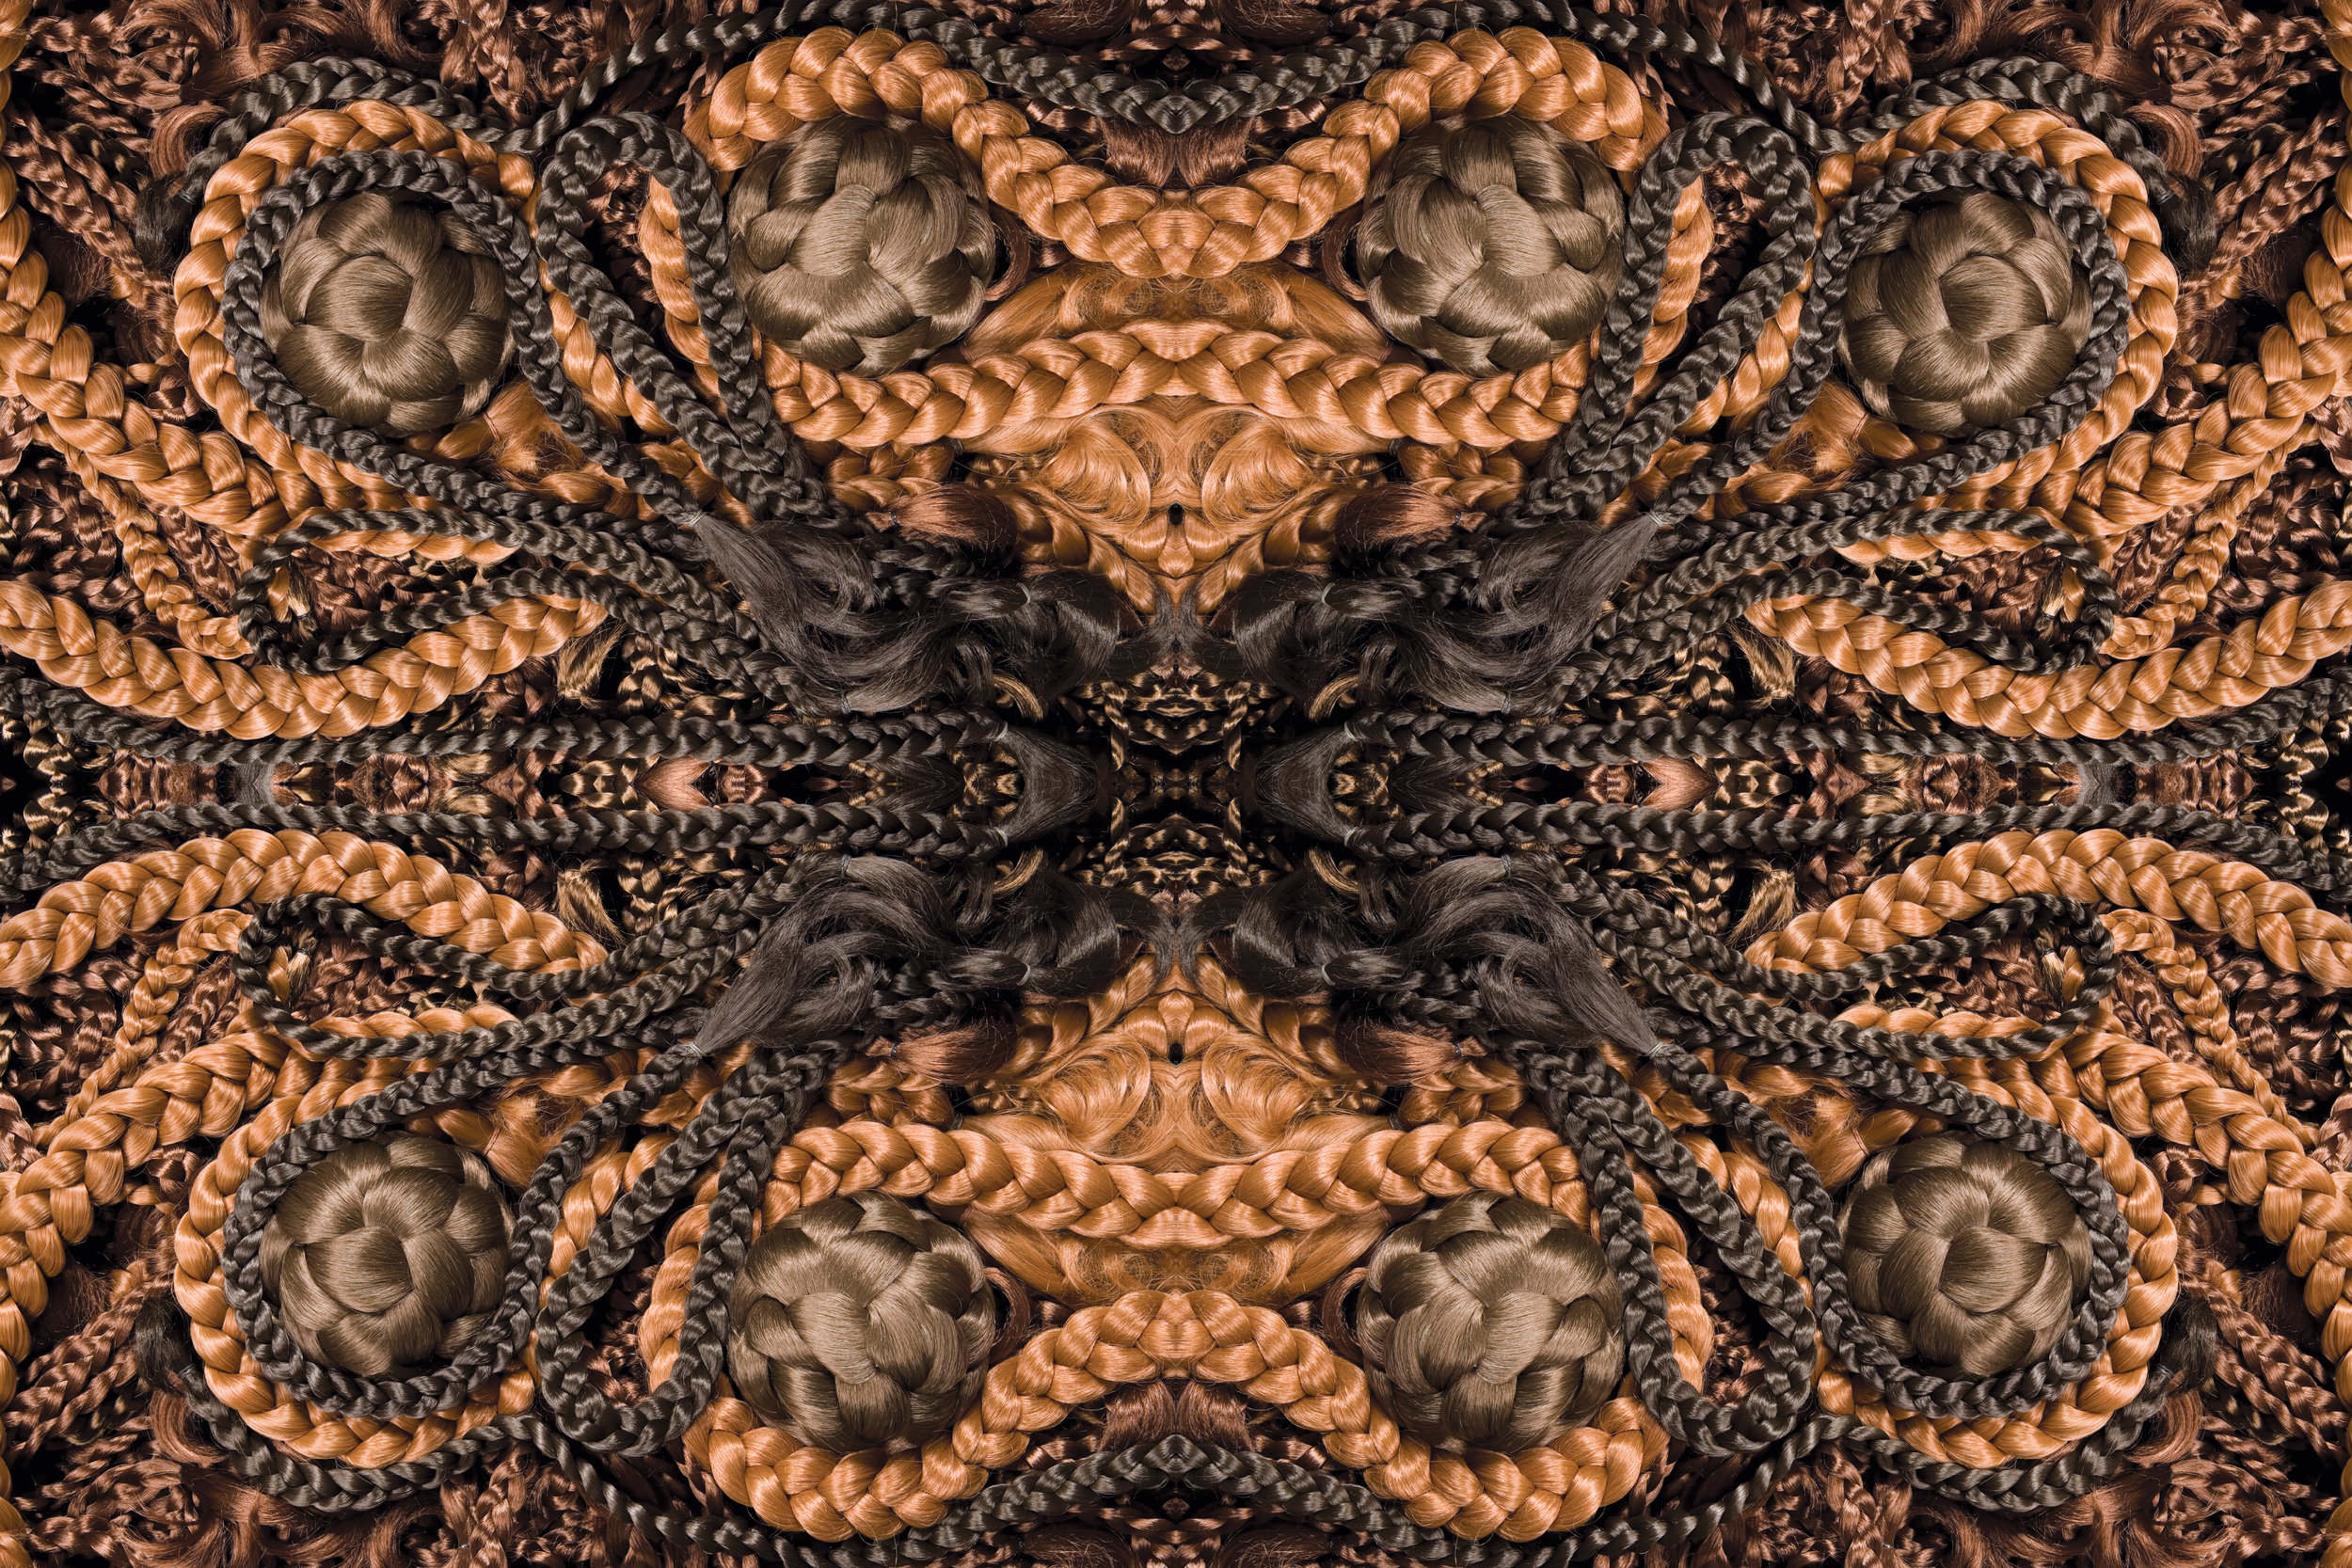 harmonic_hairdo_nr2-cprint--hrafnhildur_arnardottir_aka_shoplifter-formatted for CIA book-CLD060810_069.jpg